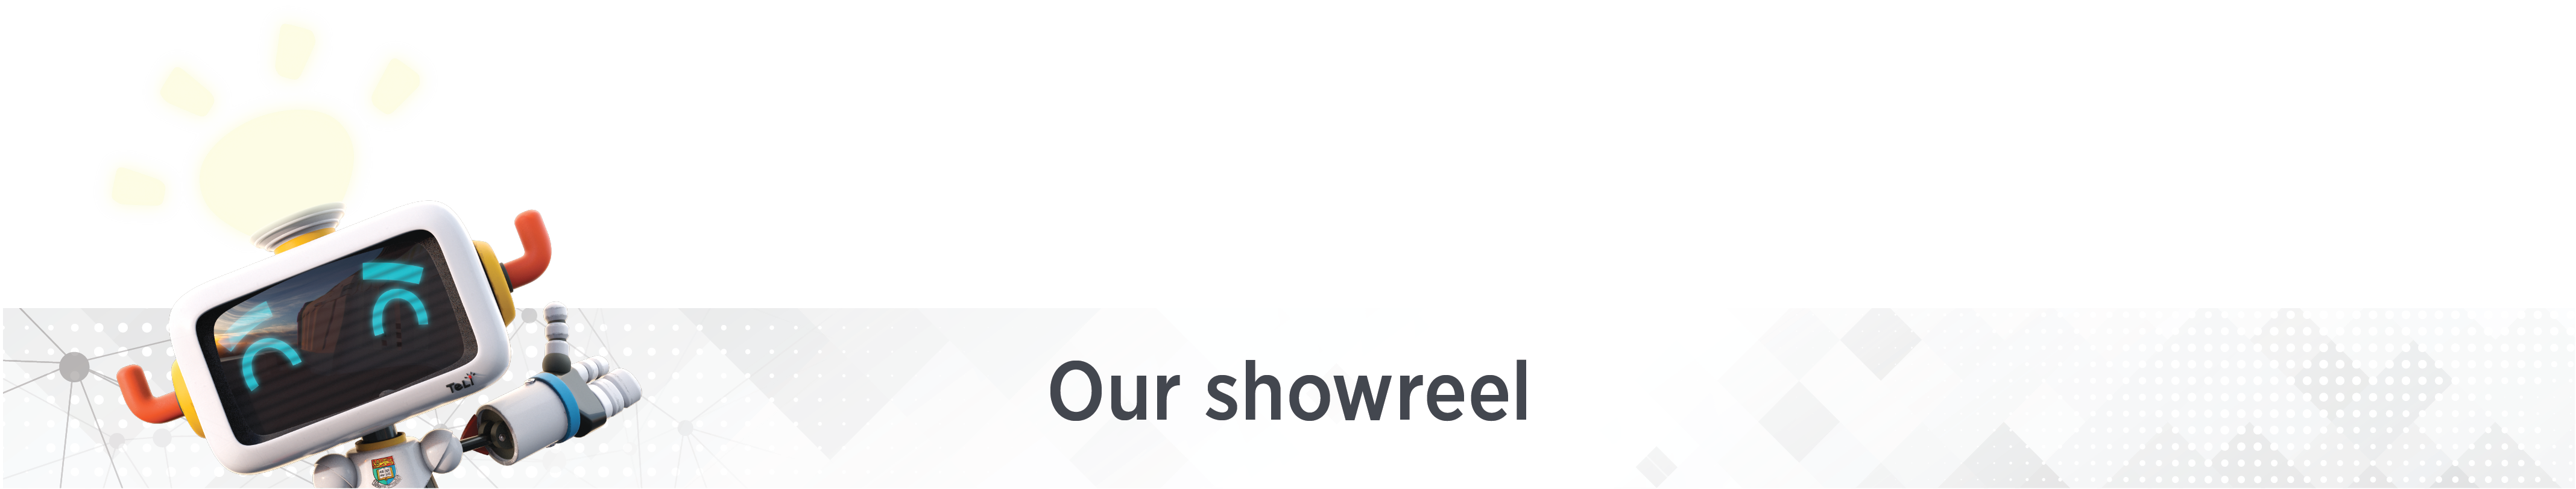 showreel-banner